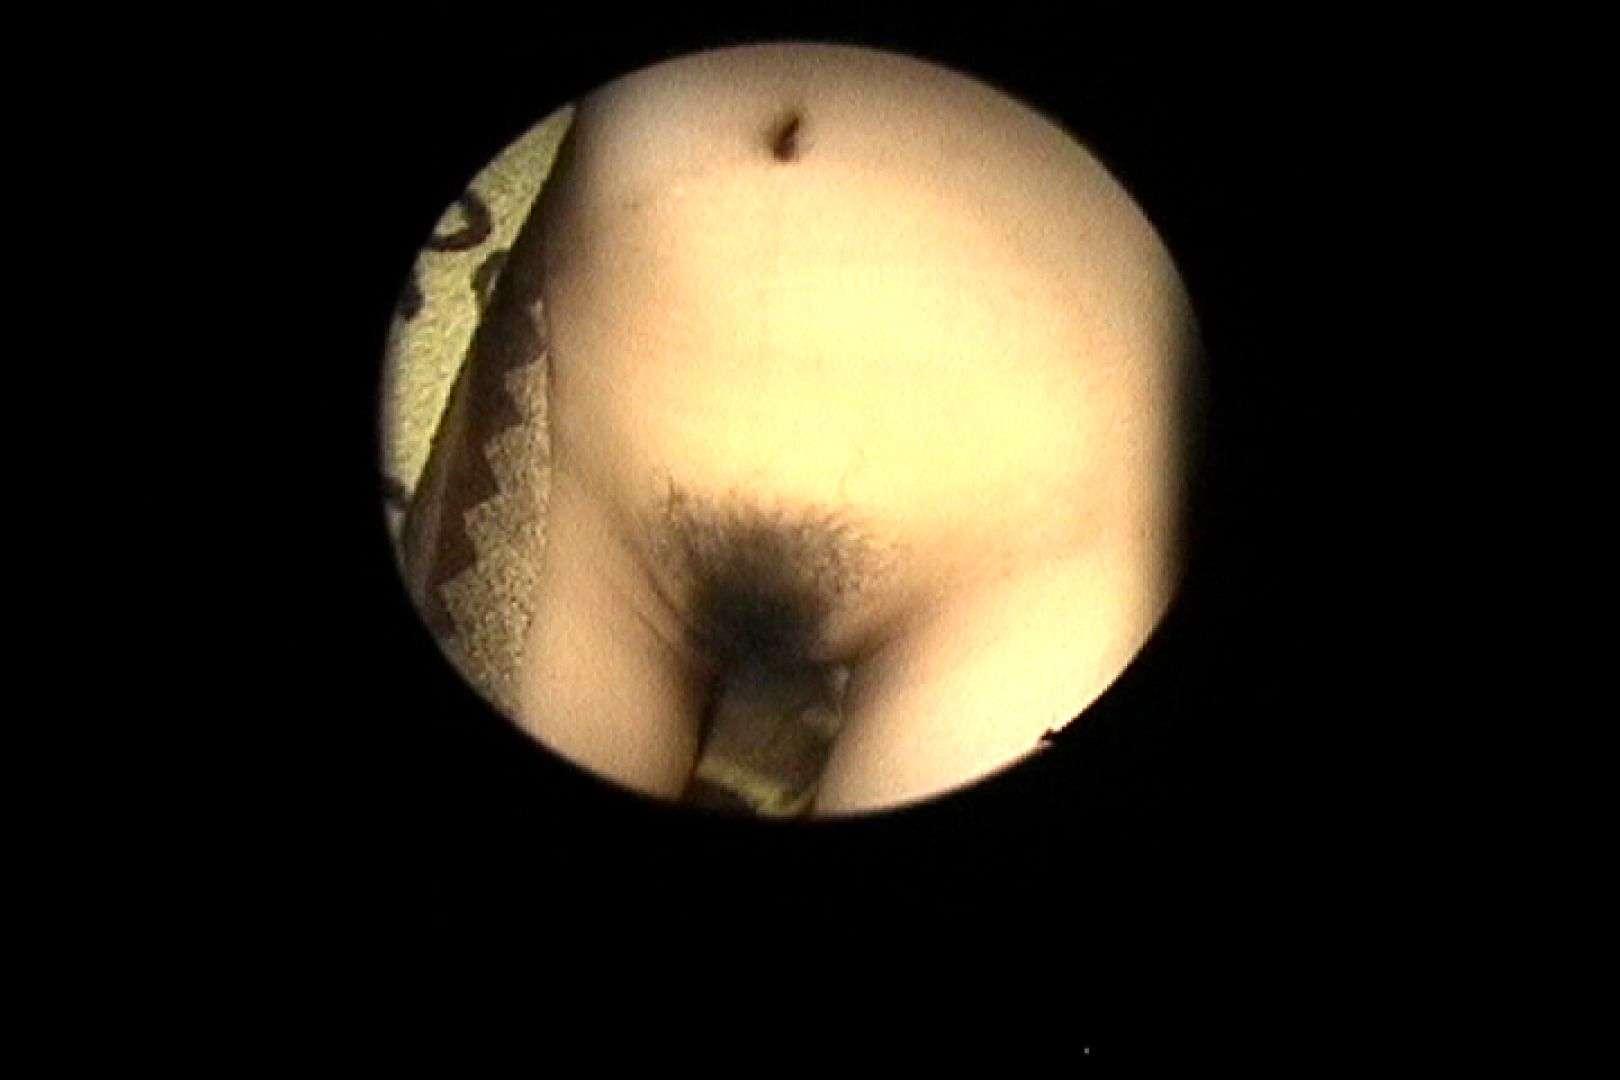 No.41 陰茎から滴り落ちる水滴 接写 | ギャル  20画像 17